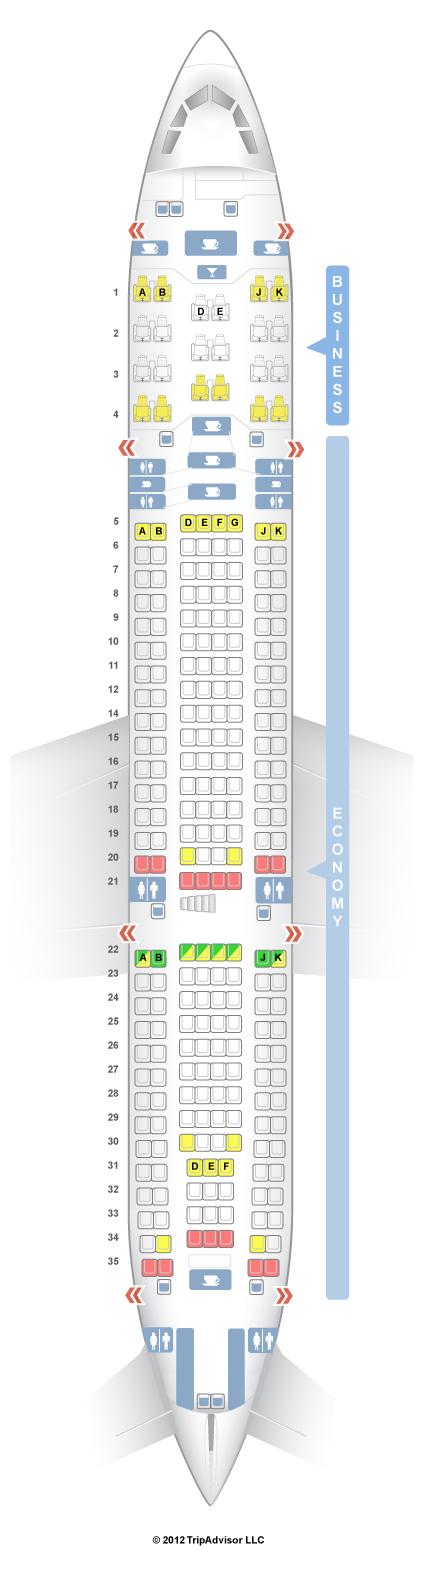 Seatguru Seat Map Turkish Airlines Airbus A330 200 332 V1